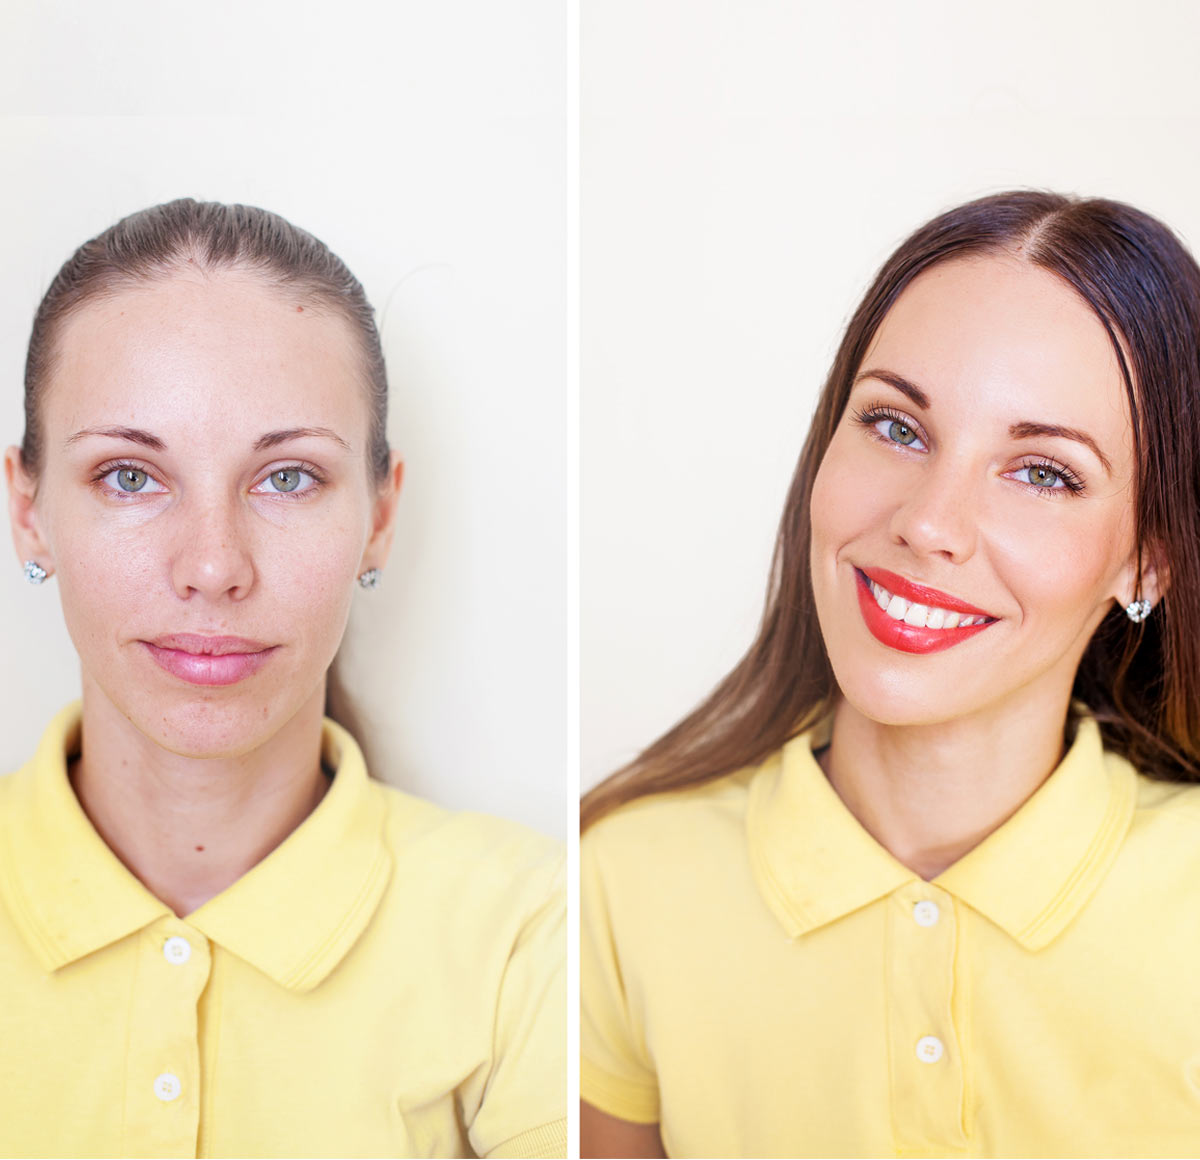 Treatment Solution for Smile Makeover